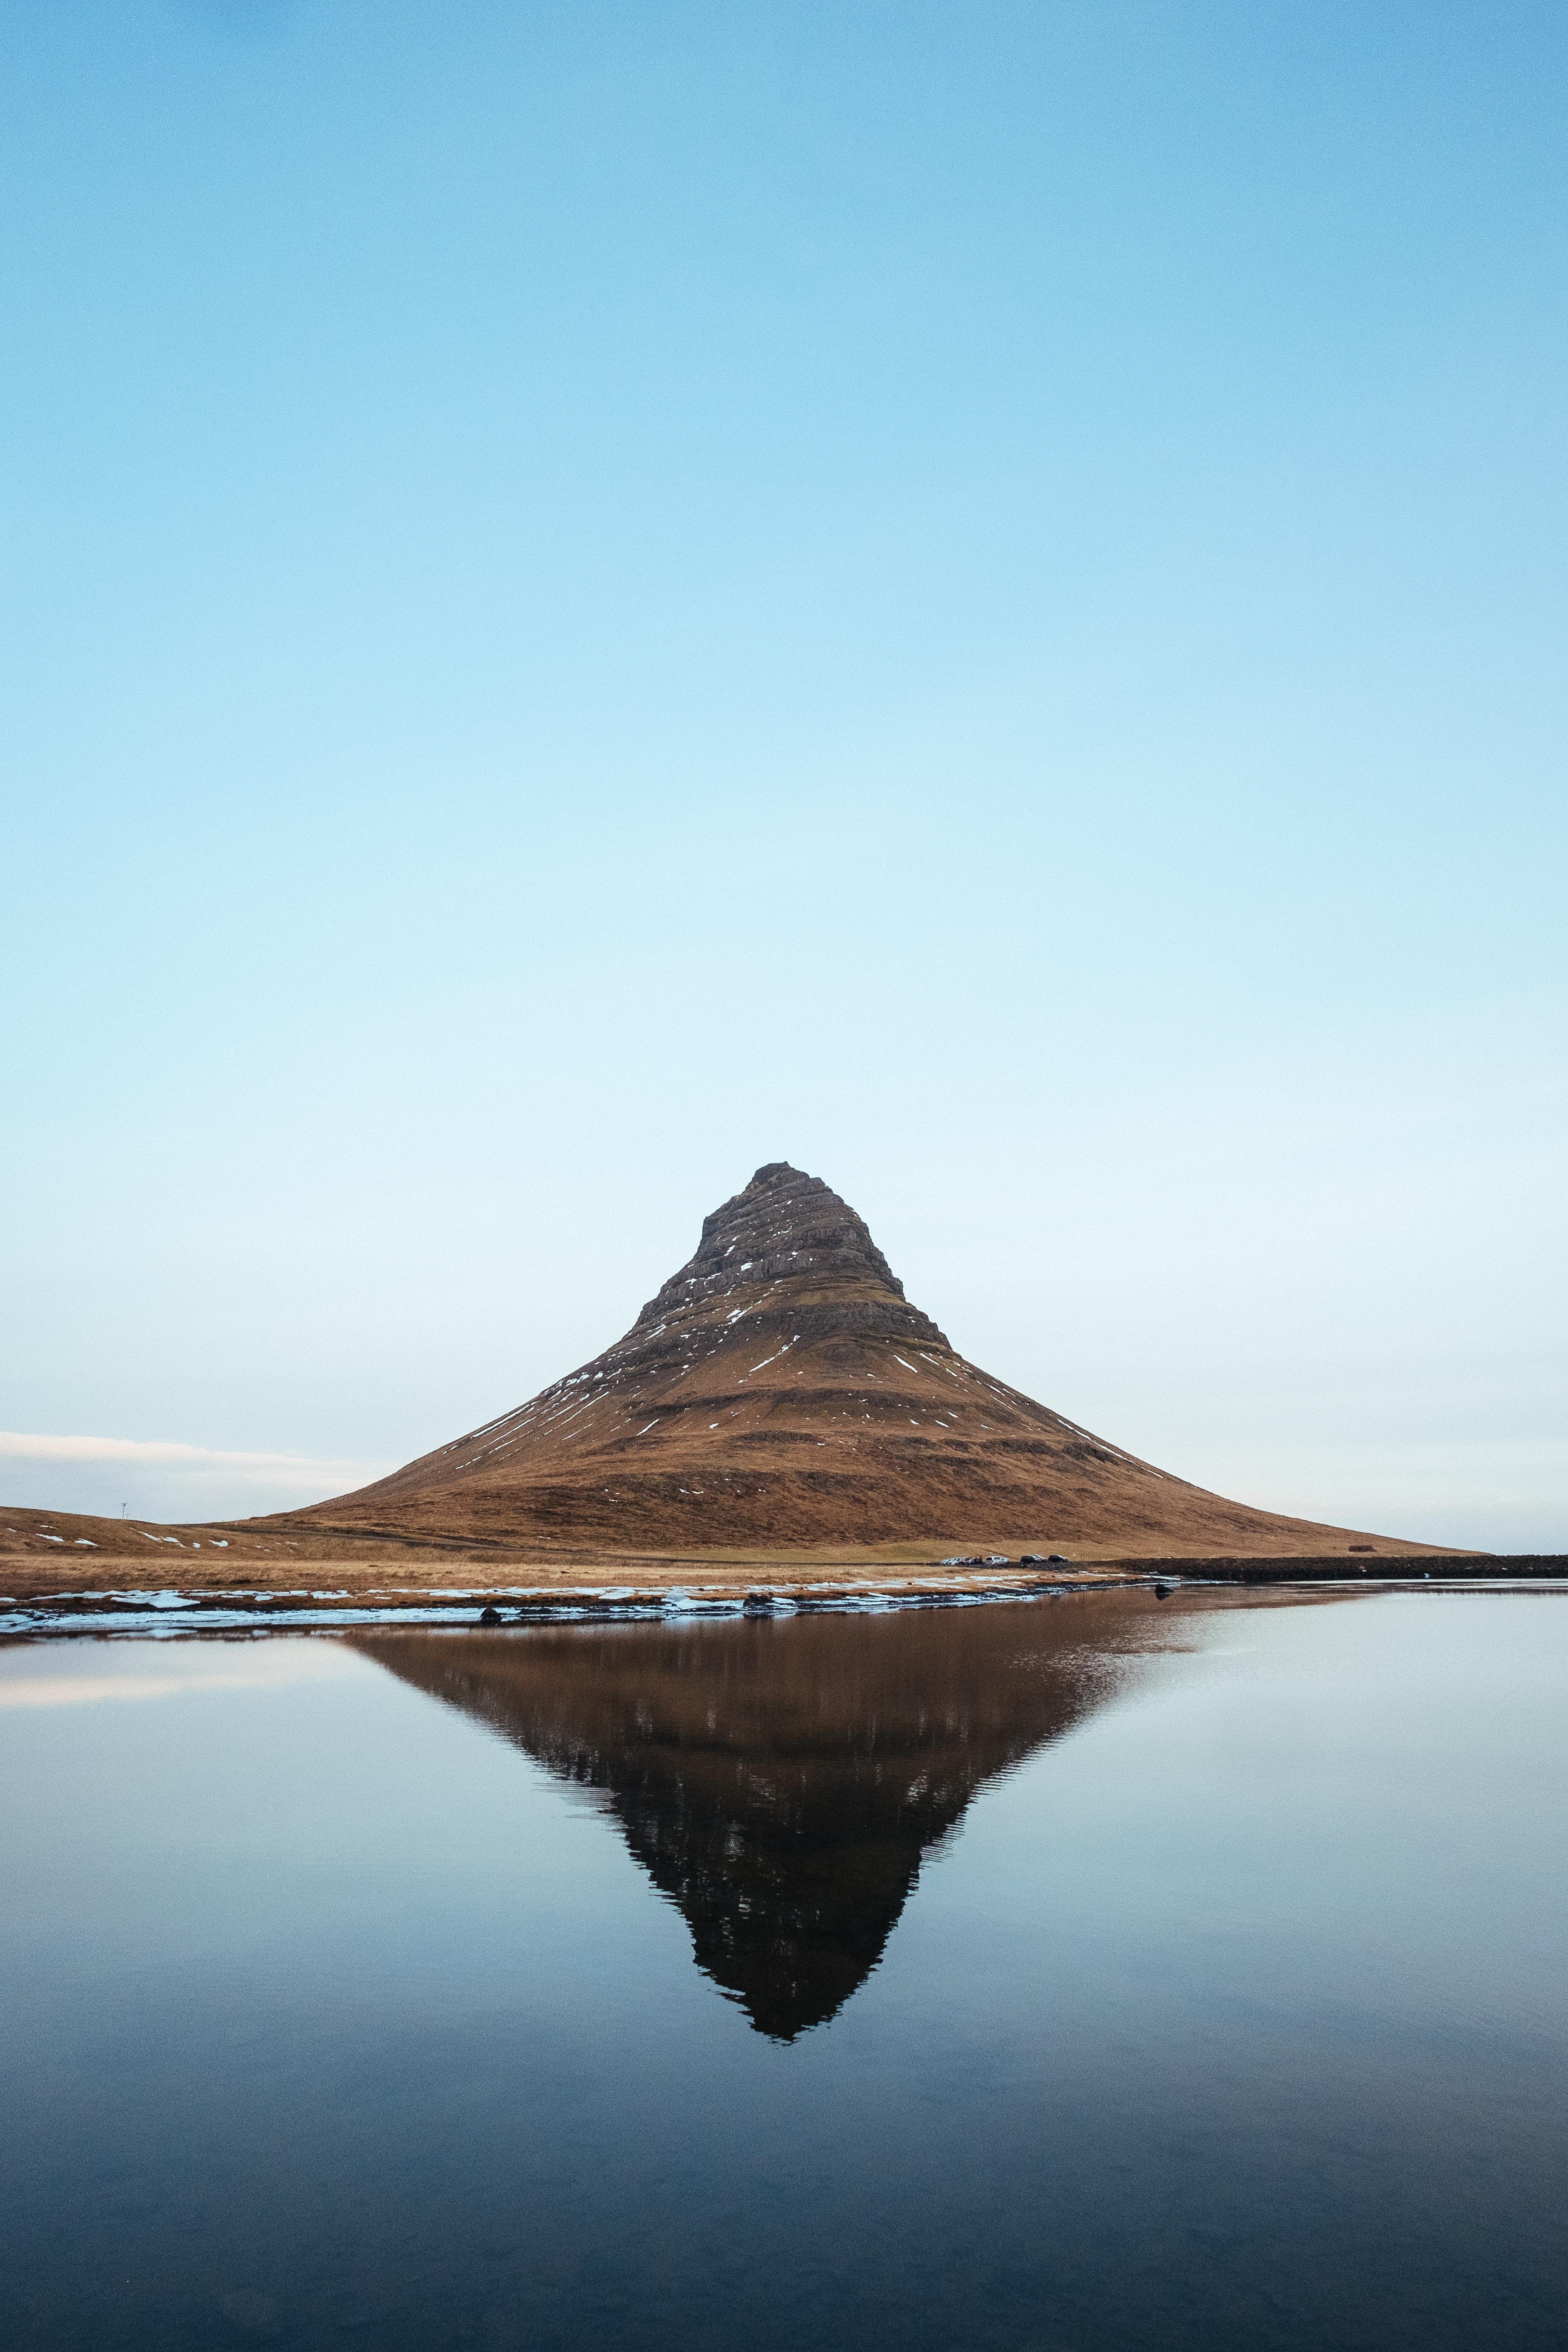 mountain near body of water photo